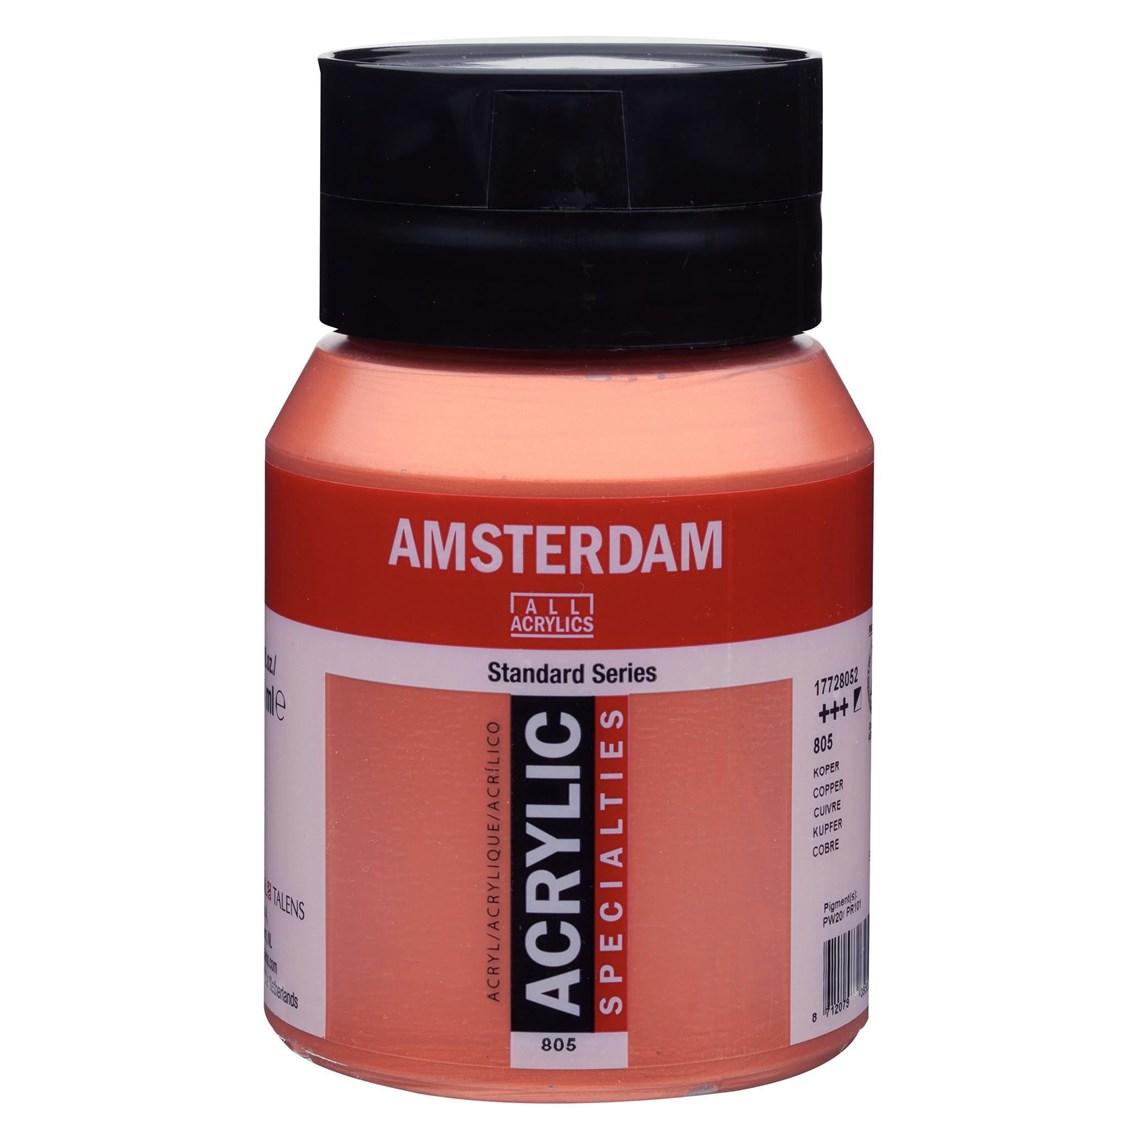 Amsterdam Acryl Koper 805 specialties Angelart Kunst en zo